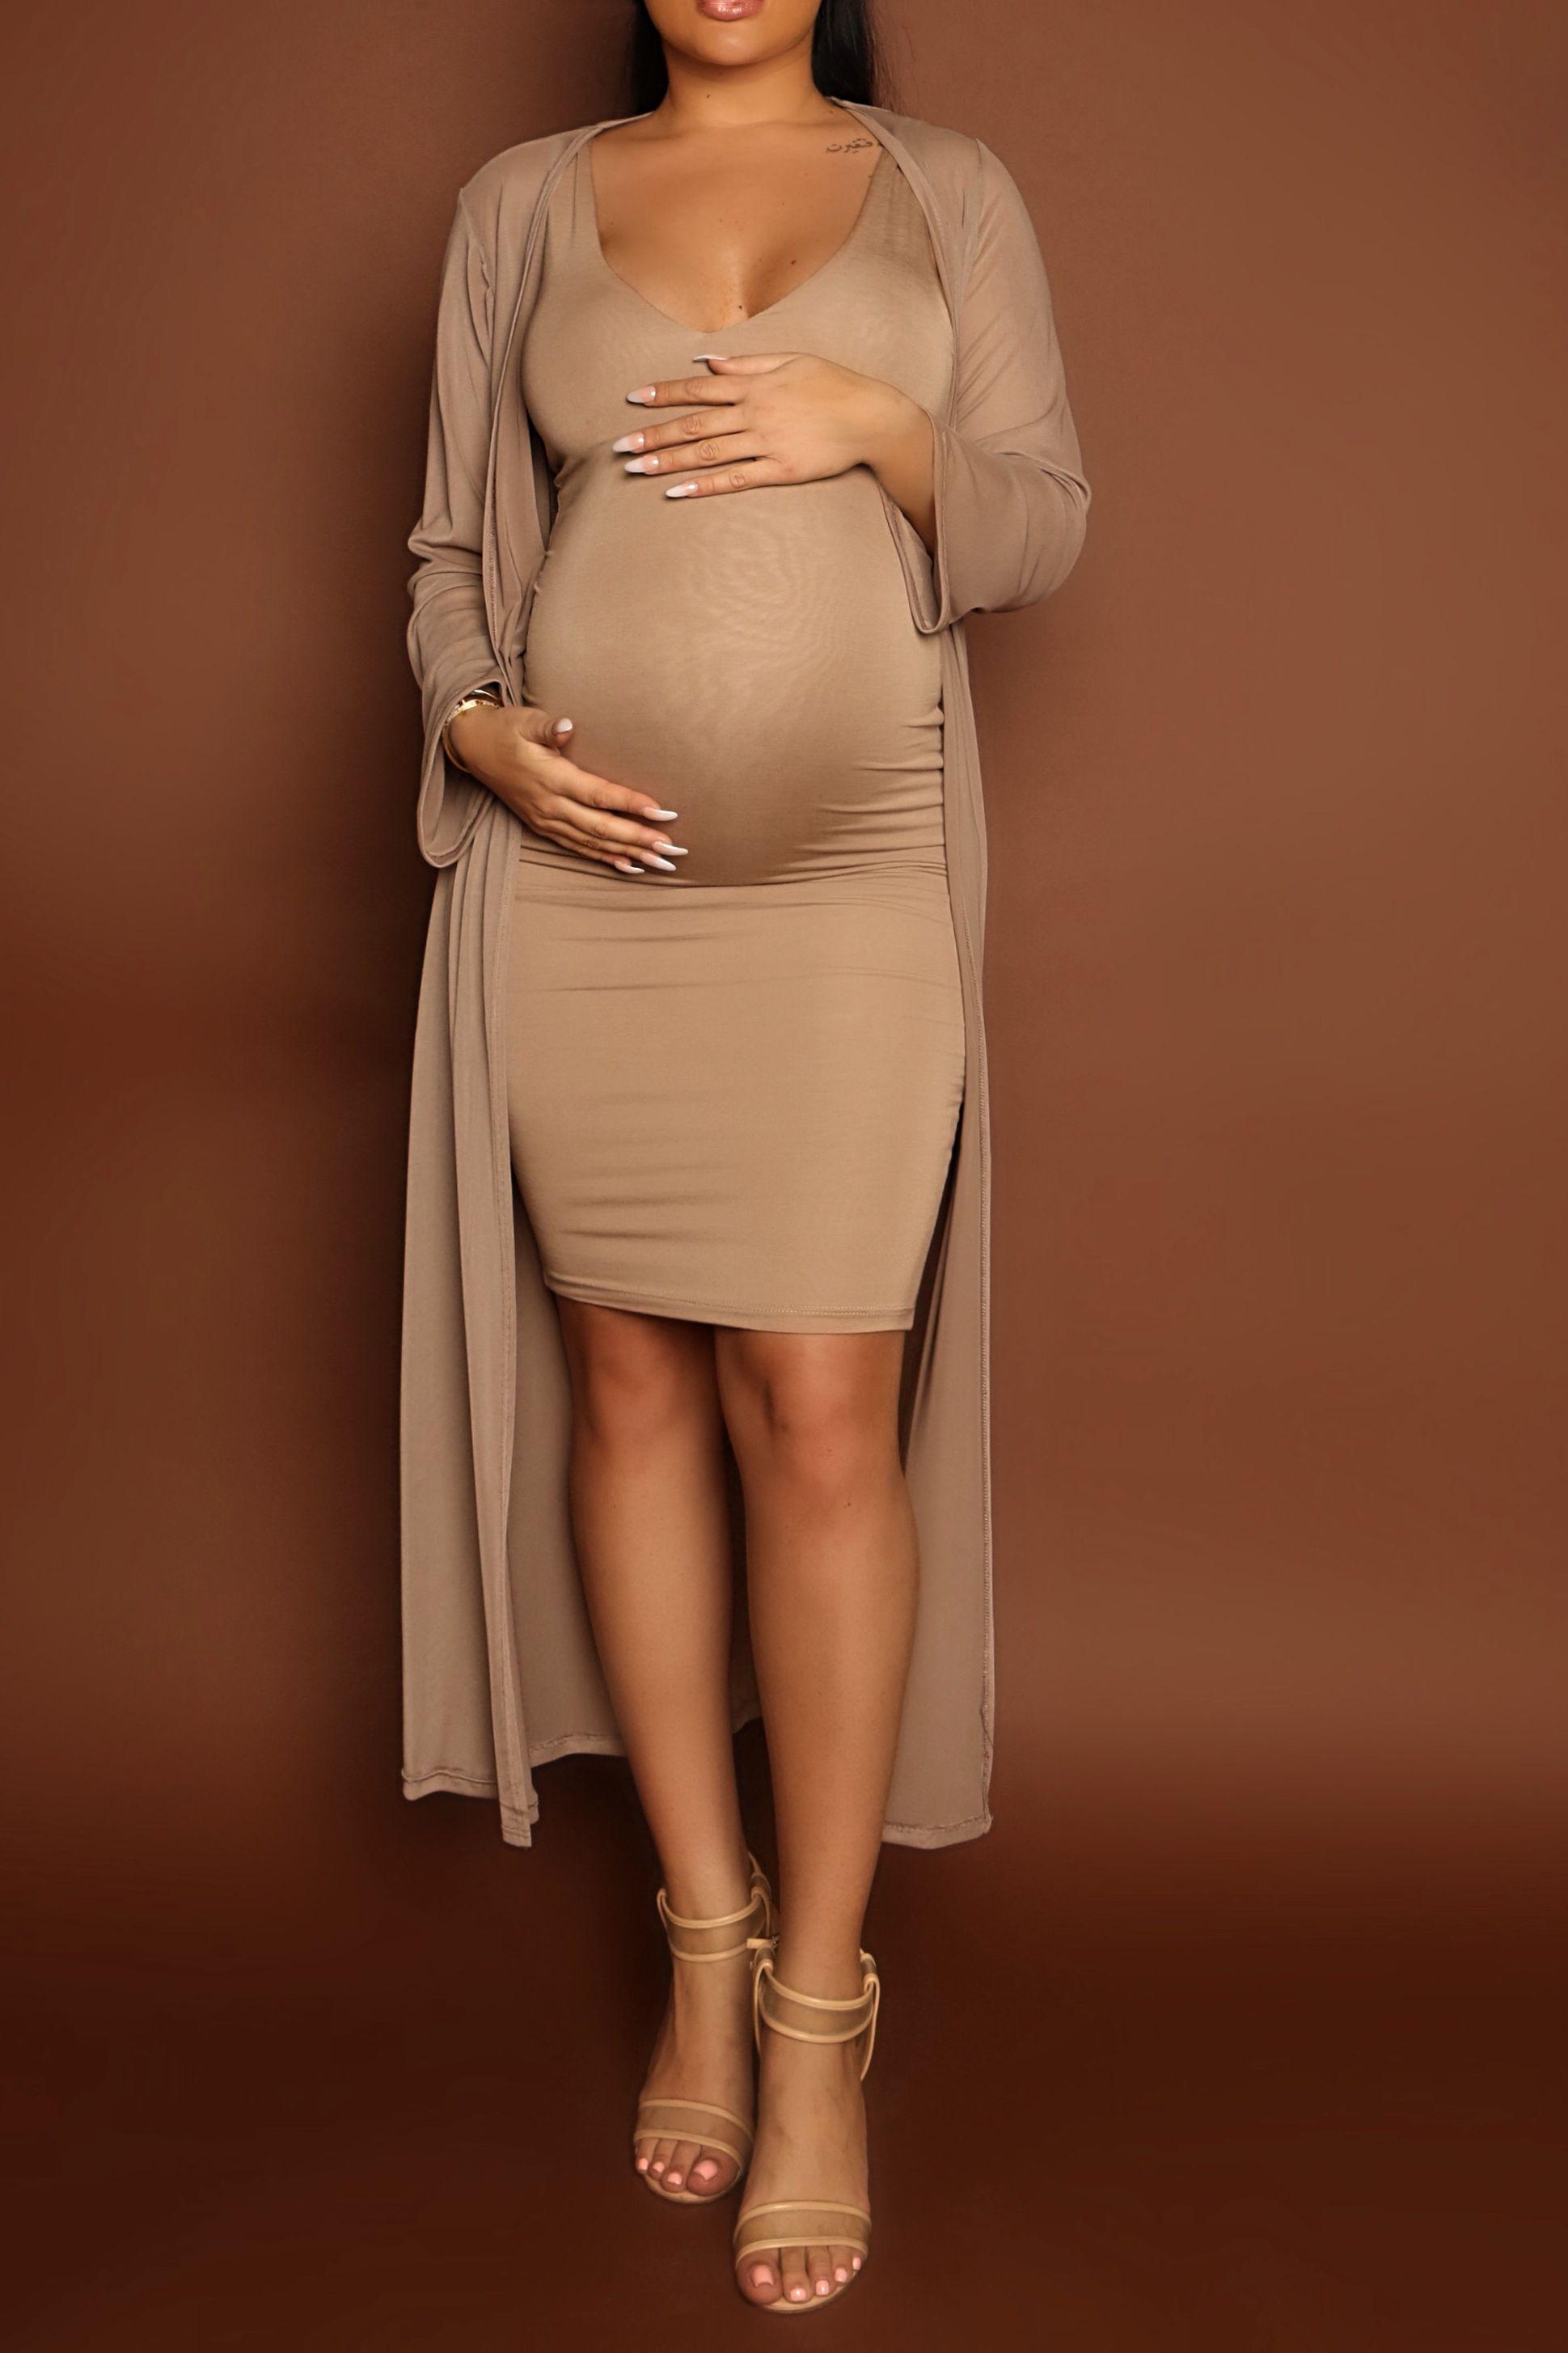 Stylish Baby Shower Dresses : stylish, shower, dresses, Maternity, Stylish, Outfits,, Dresses, Shower,, Outfits